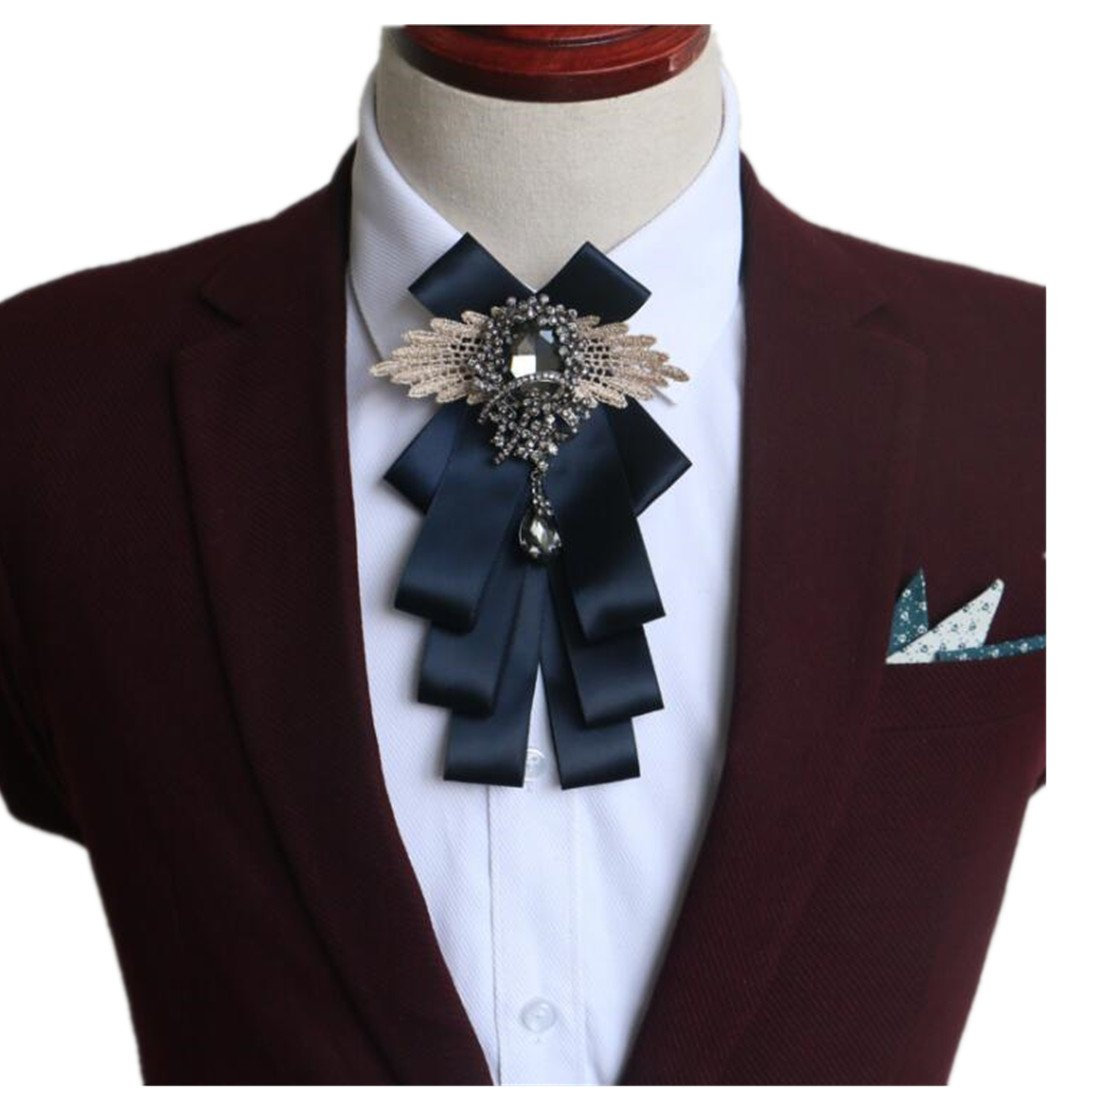 FUMUD Men Bow Tie groom's Clothing Accessories Solid Color Gentleman Shirt Neck Tie Bowknot Diamond Grid Decor Wedding Gift (1#)